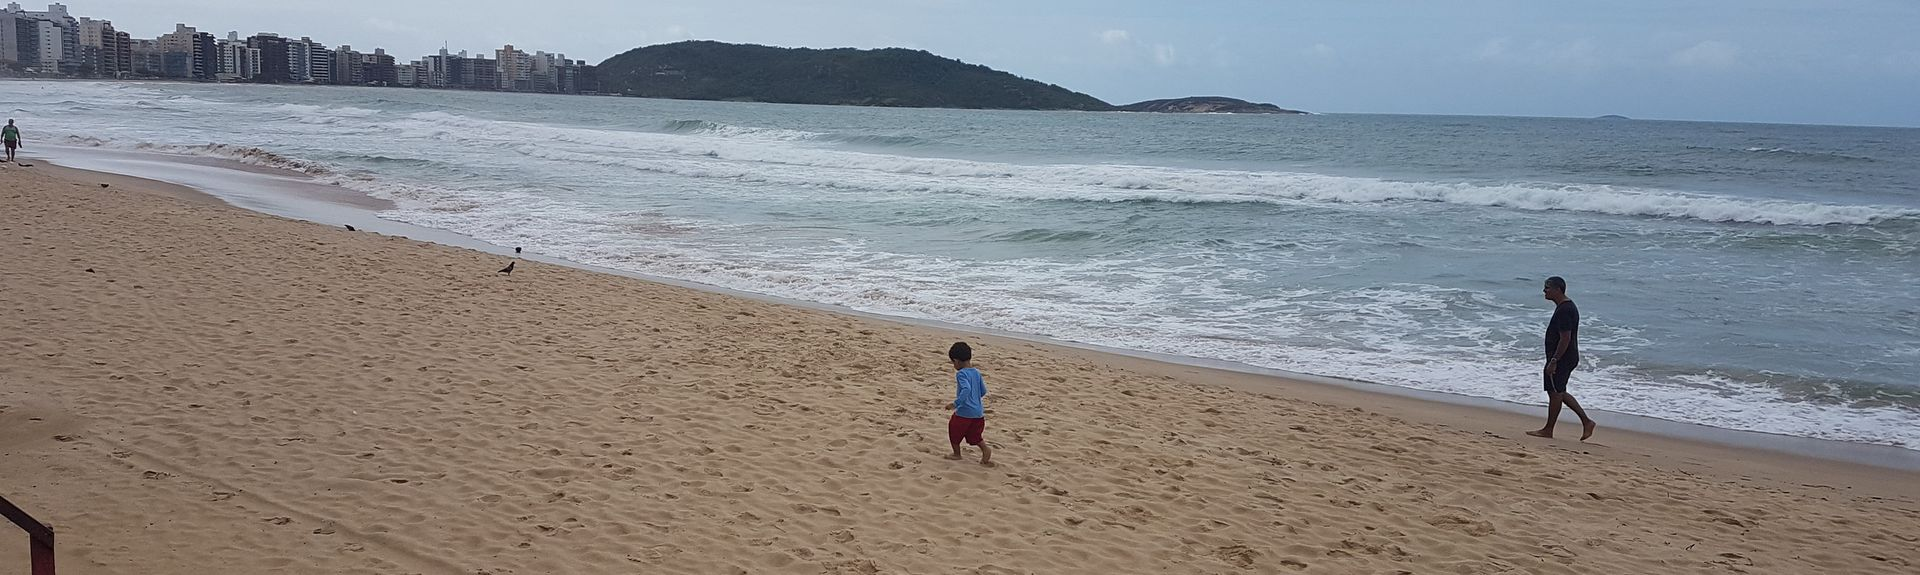 Castelhanos Beach, Anchieta, Brazil